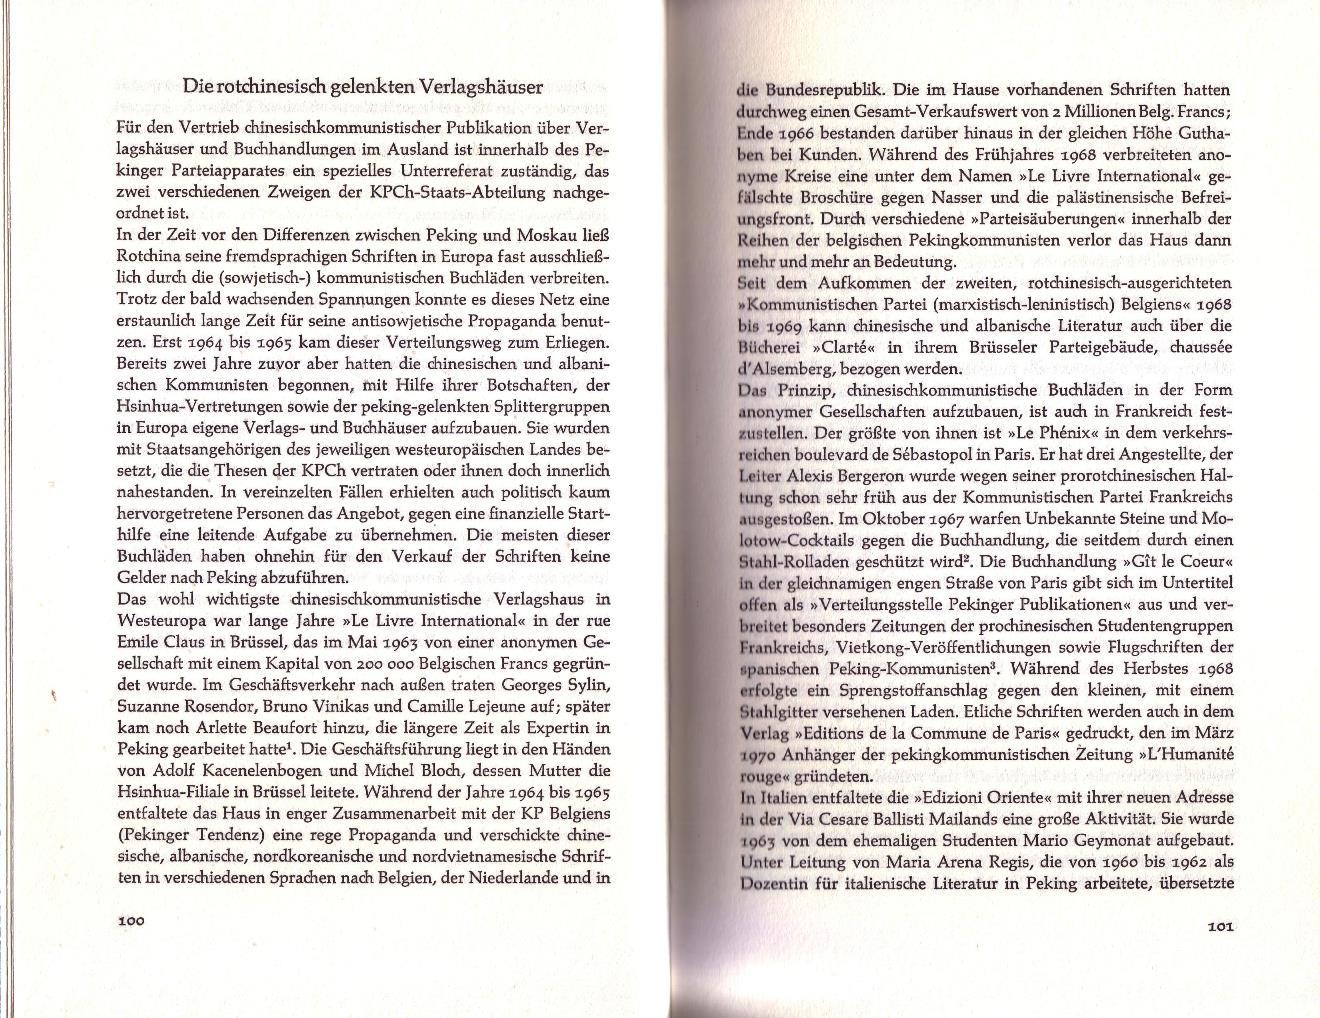 Schlomann_Friedlingstein_Die_Maoisten_0053